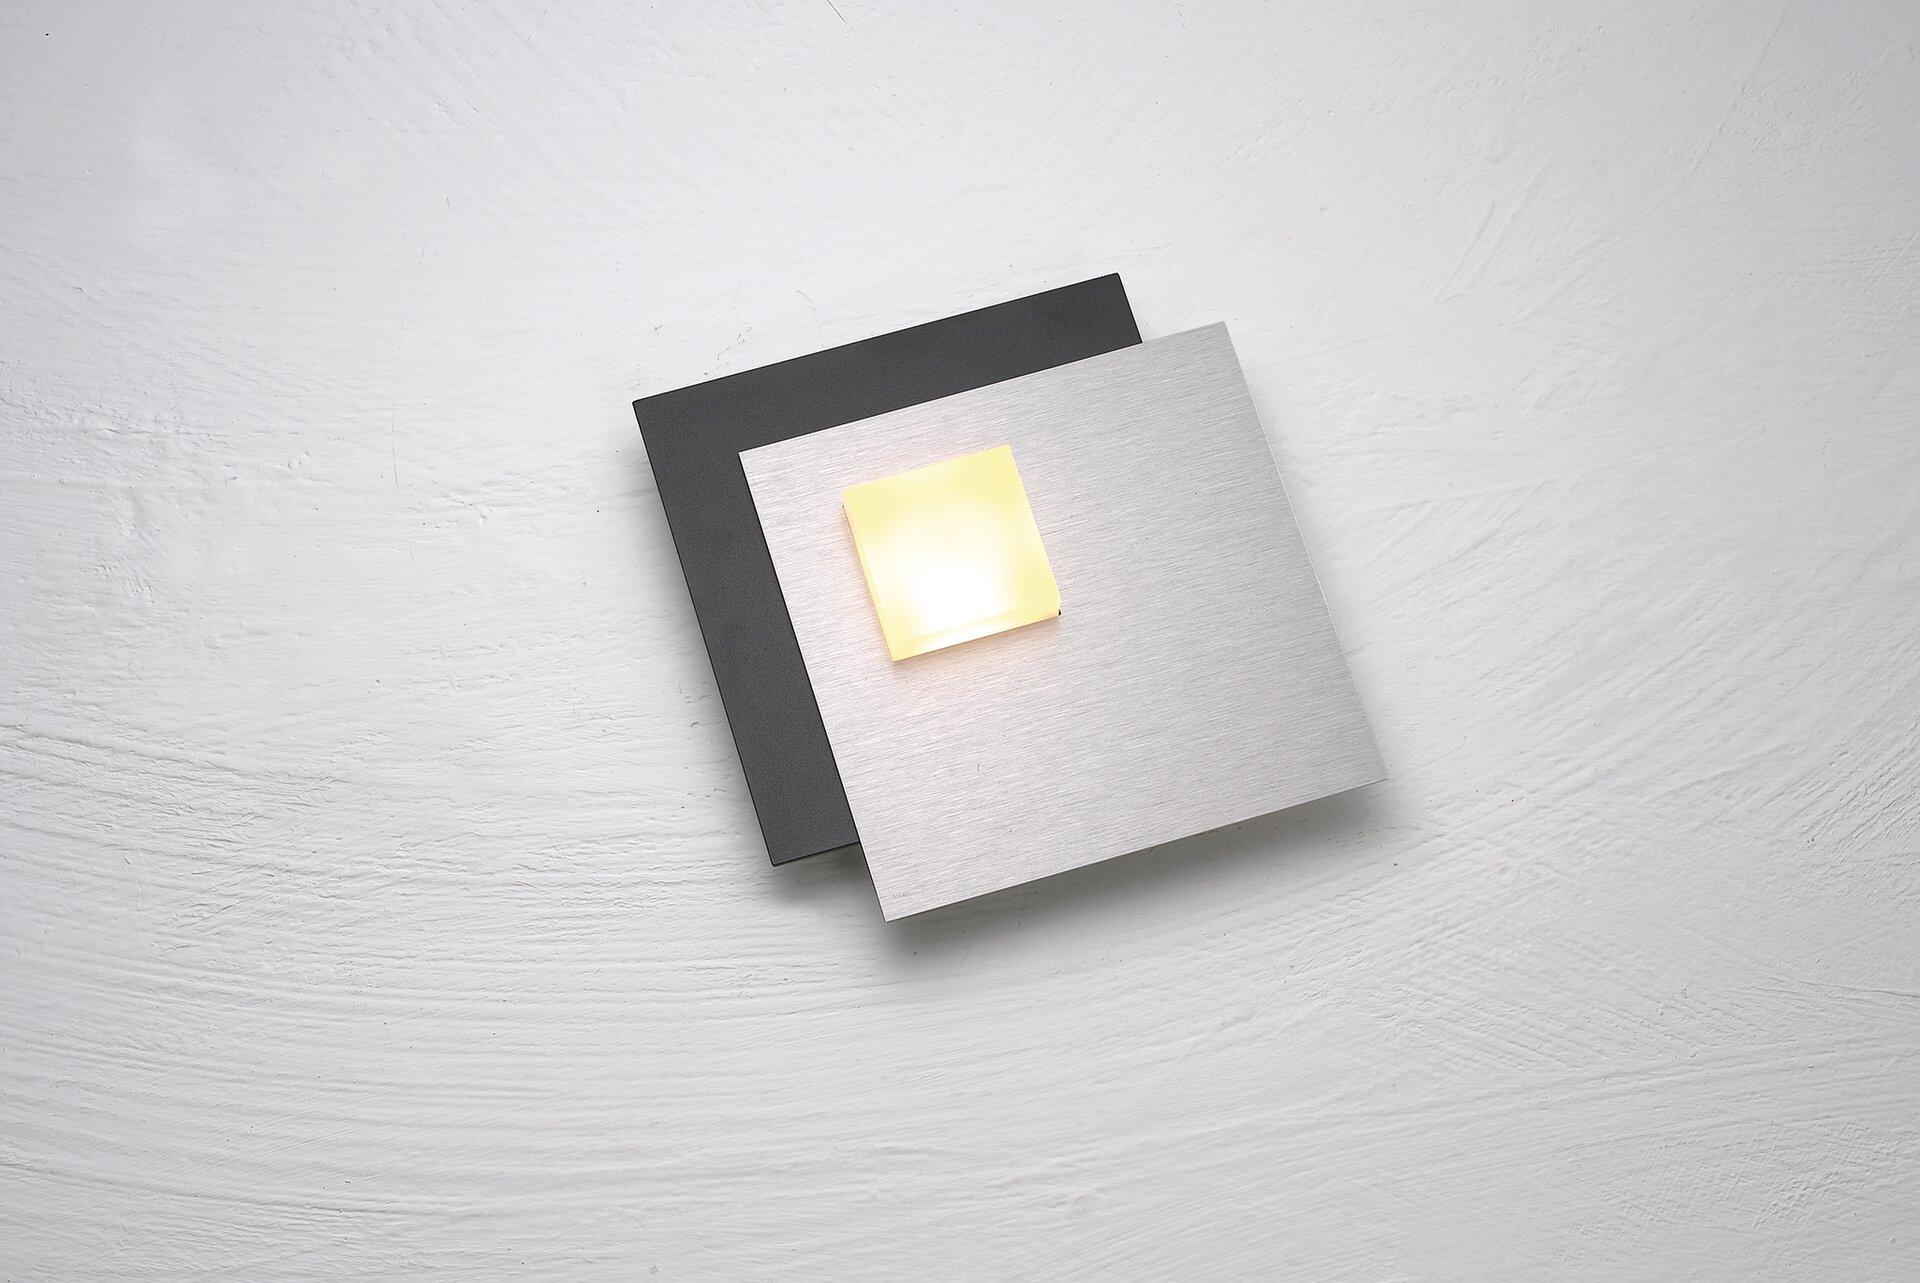 Deckenleuchte PIXEL 2.0 Bopp Metall 15 x 4 x 15 cm